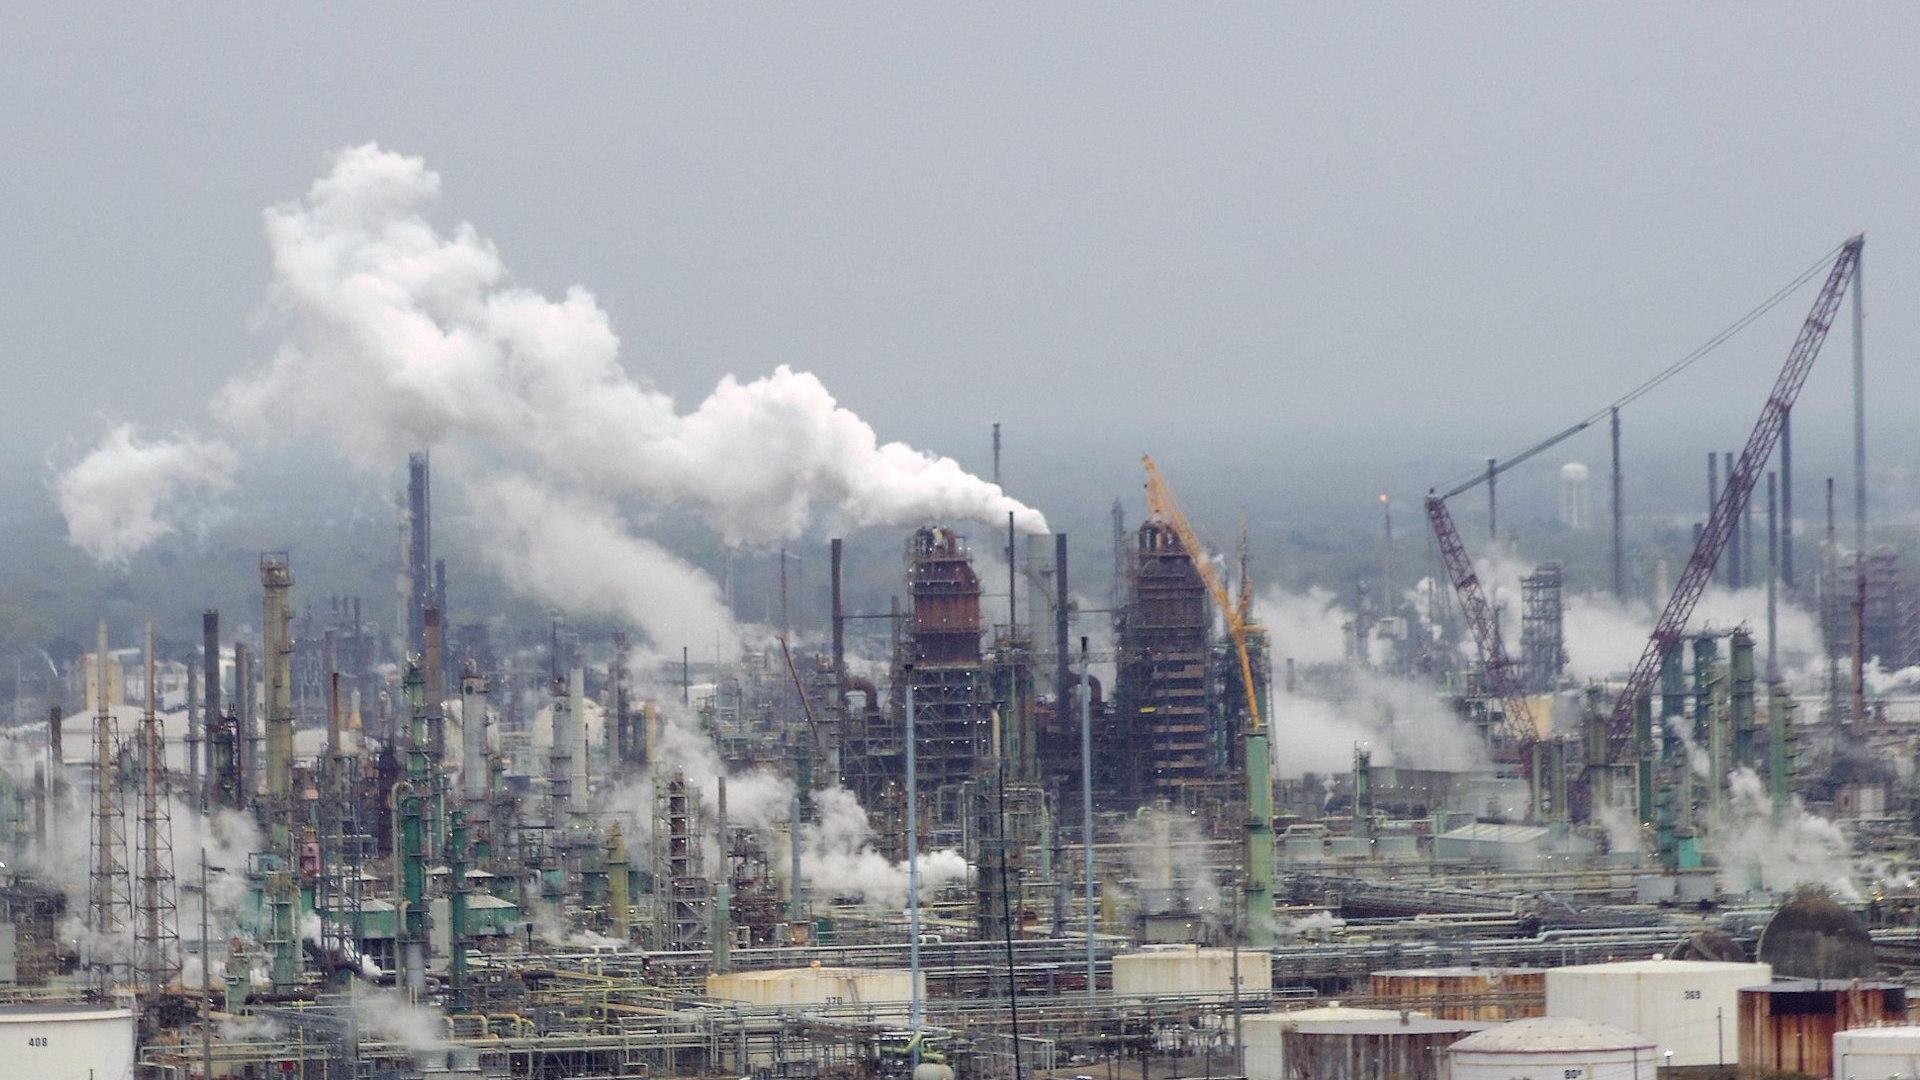 ExxonMobil oil refinery, Baton Rouge, Louisiana, by WClarke [CC BY-SA 4.0]